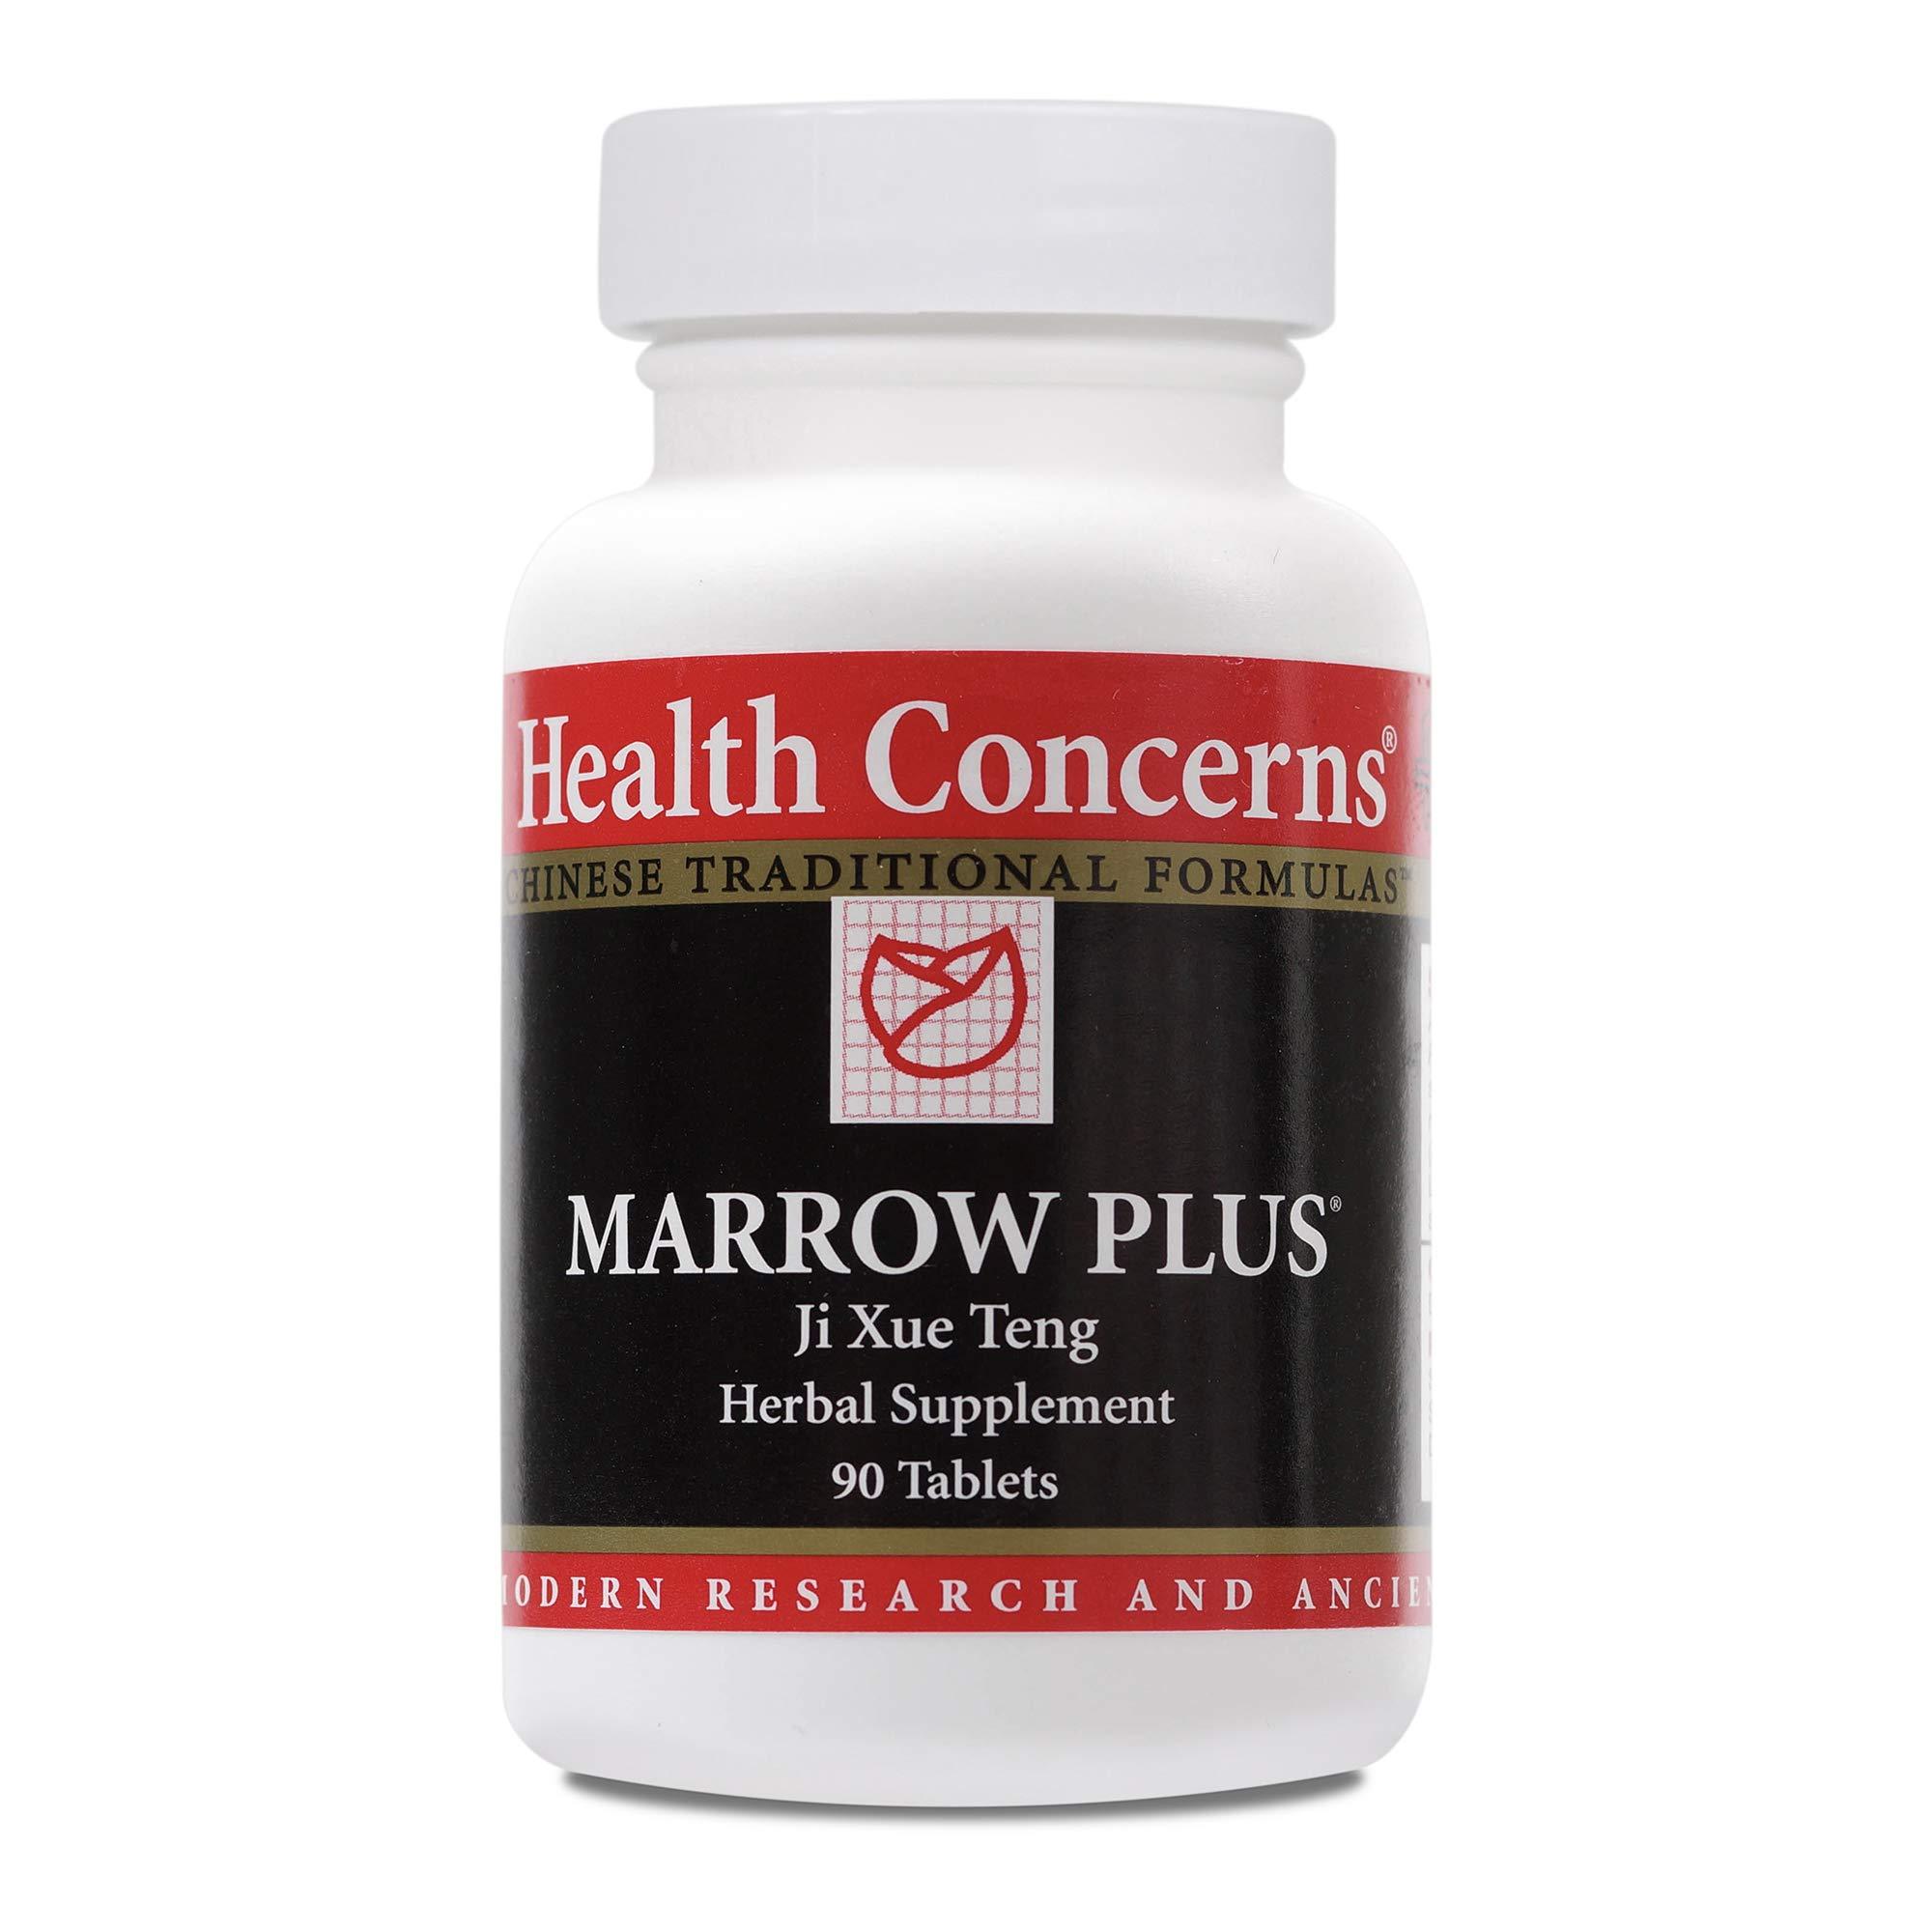 Health Concerns - Marrow Plus - Ji Xue Teng Herbal Supplement - 90 Tablets